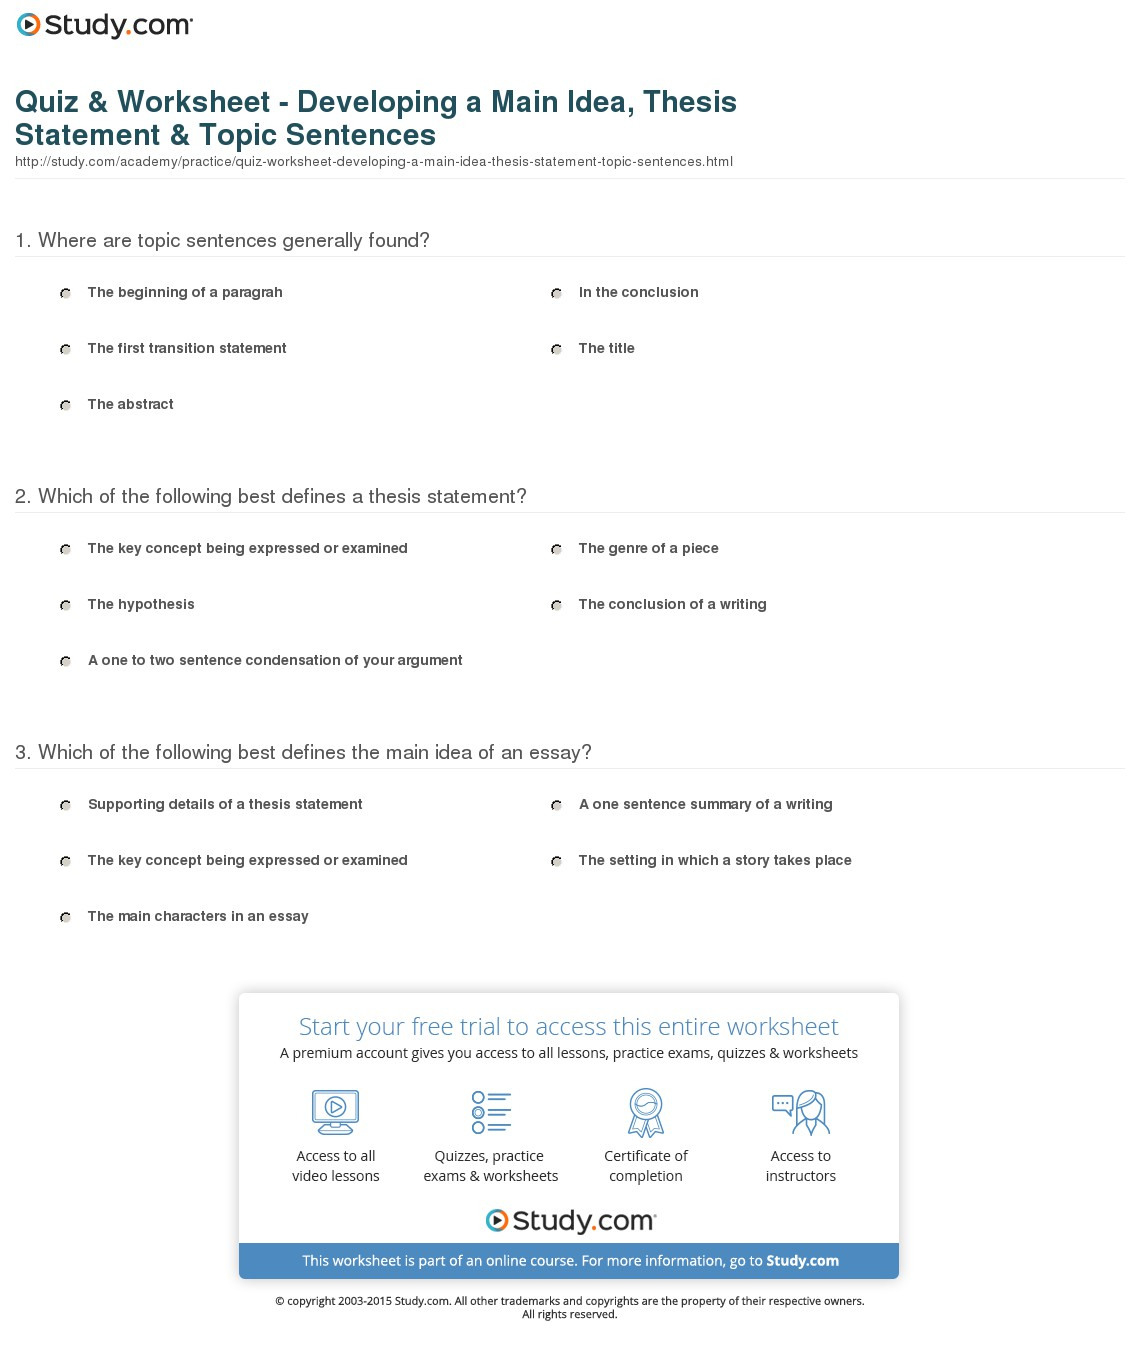 Quiz Worksheet Developing A Main Idea Thesis Statement